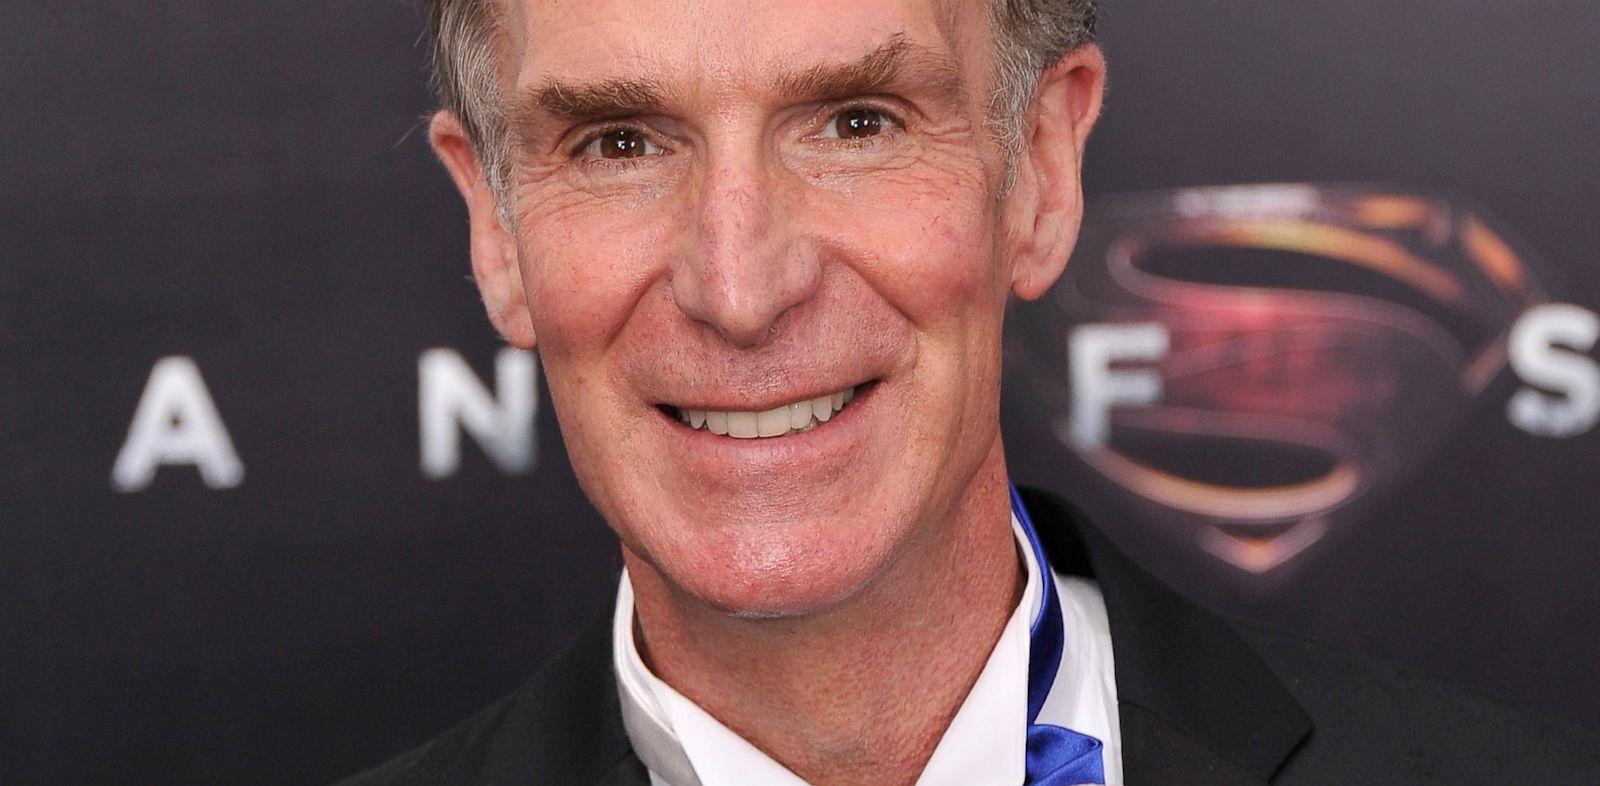 PHOTO: Bill Nye